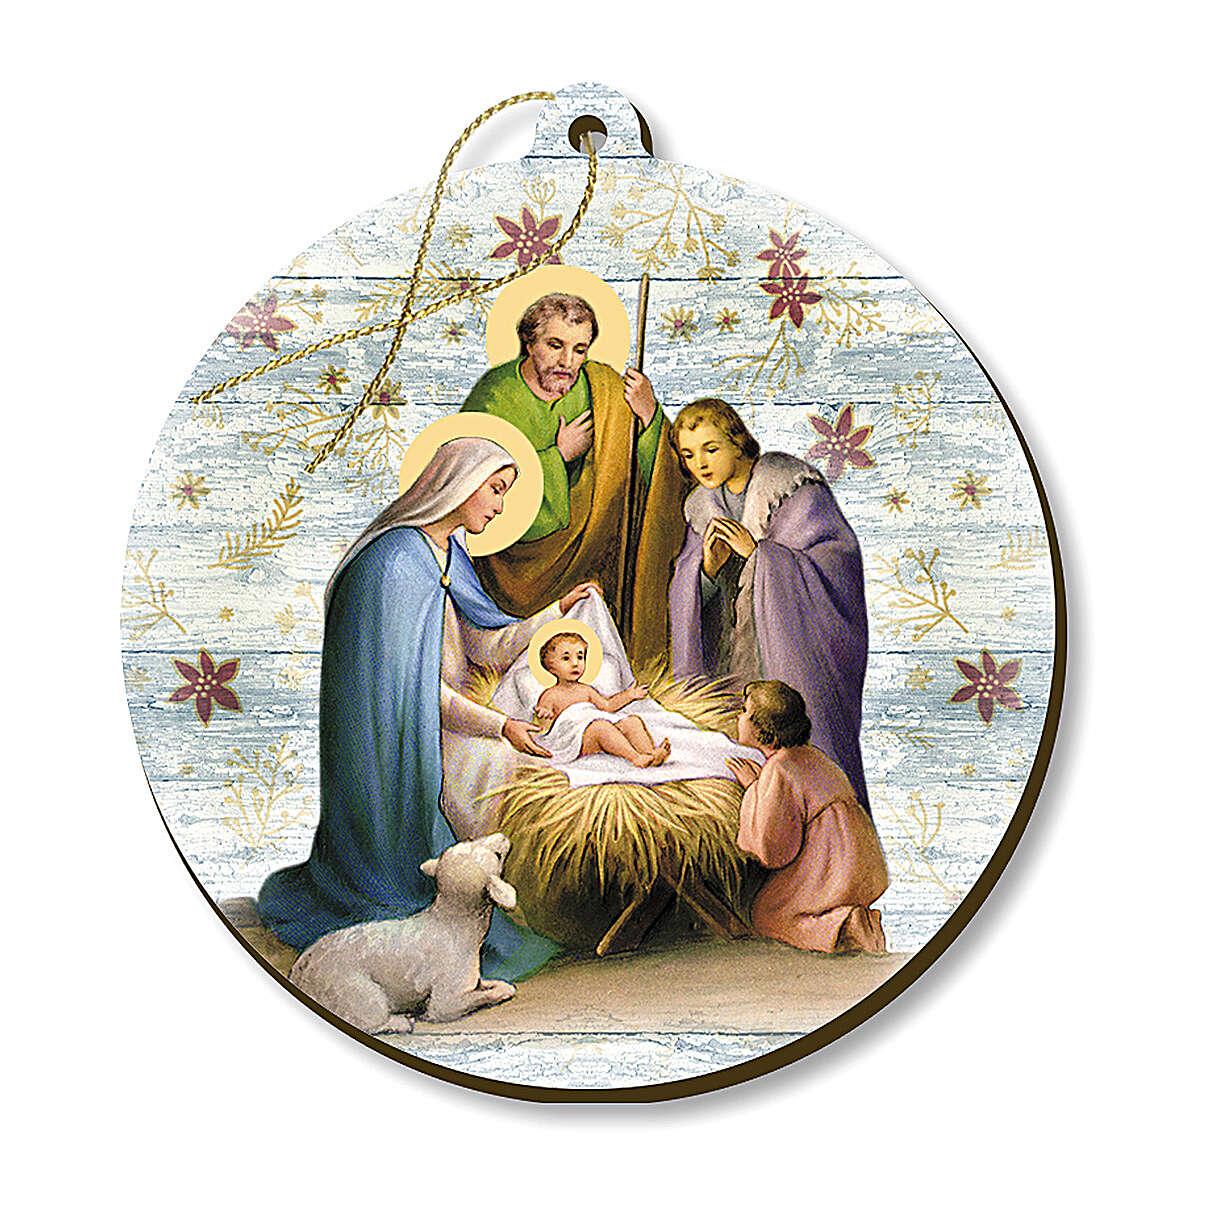 Wooden Christmas tree ornament, Nativity scene with shepherd 4